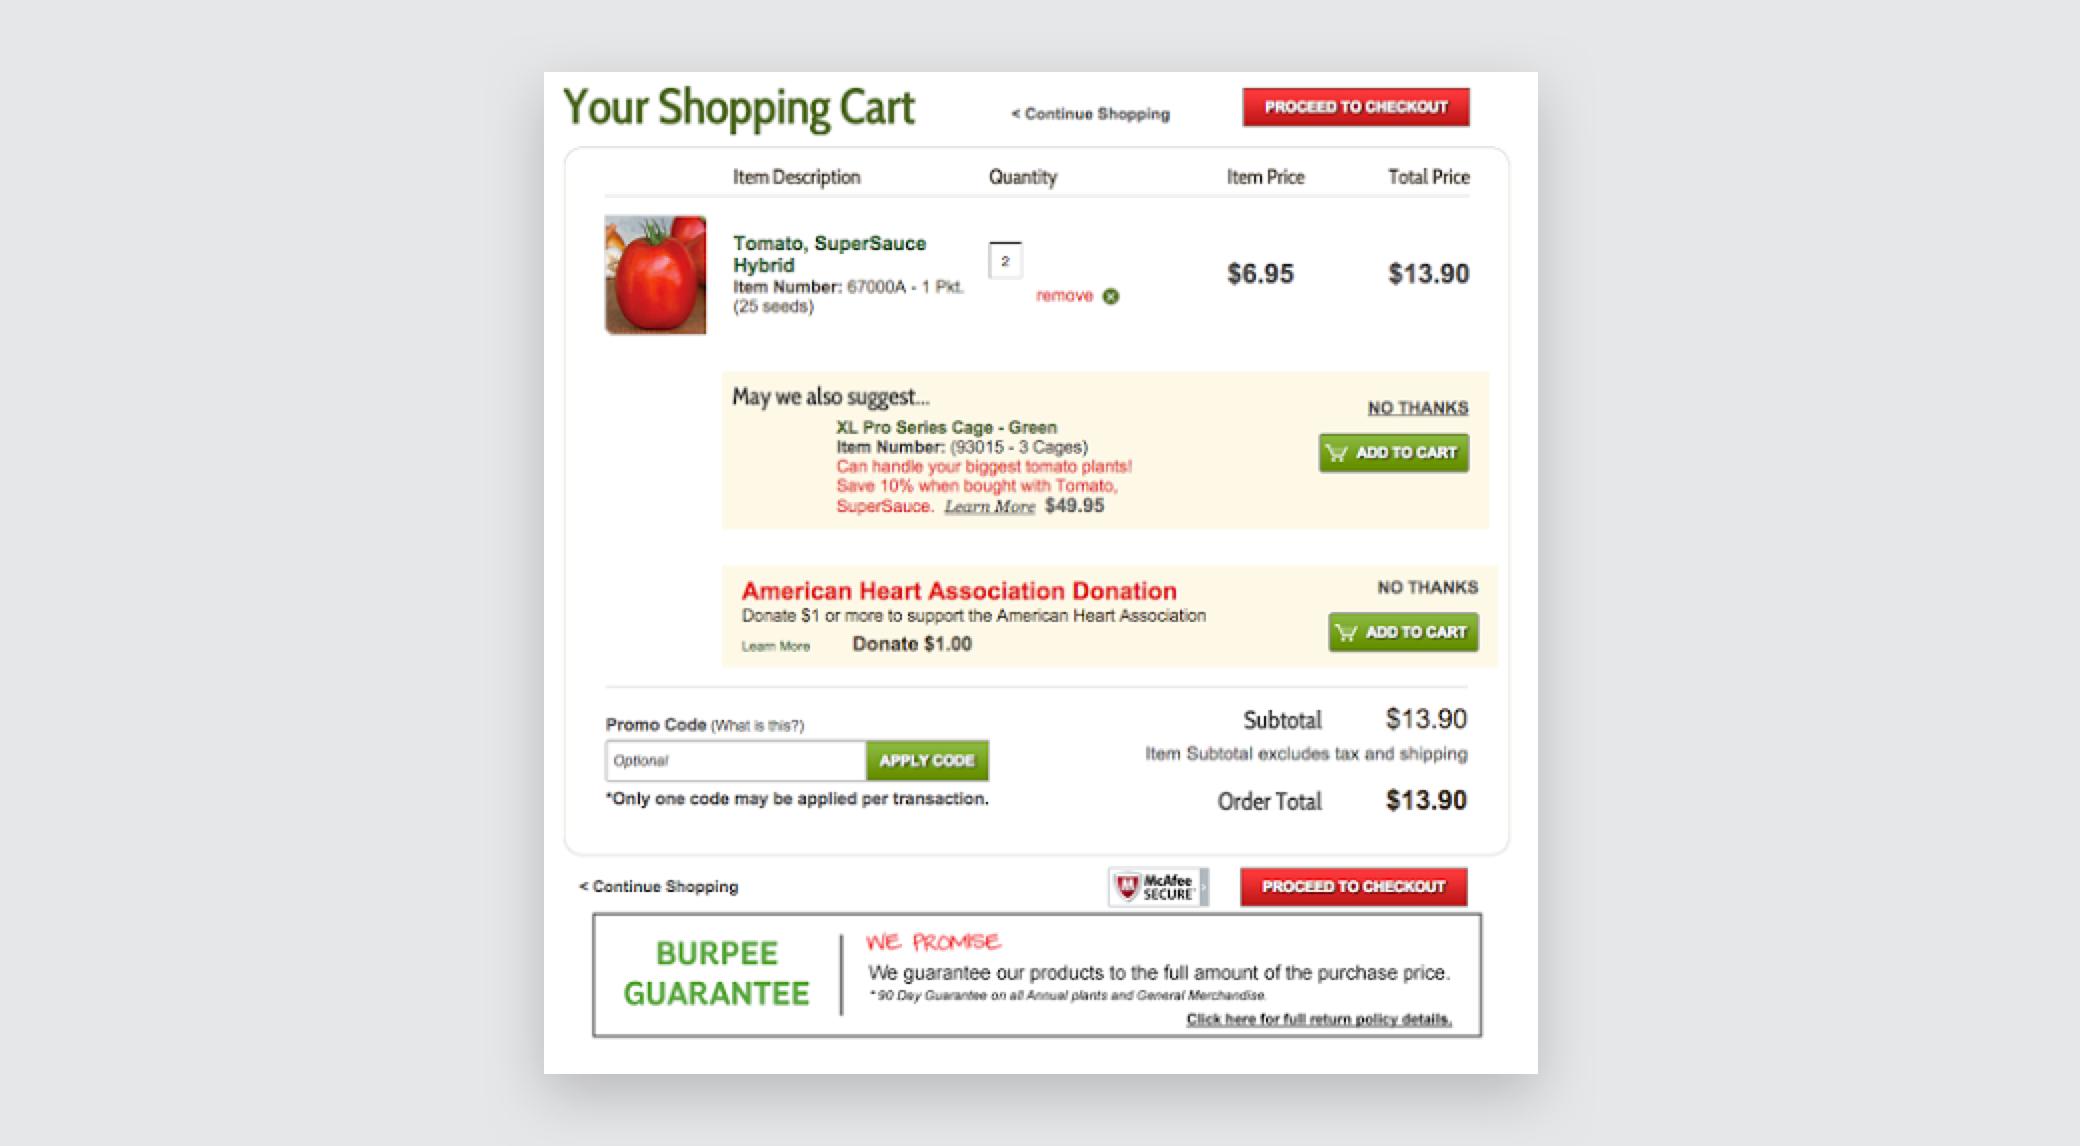 Burpee.com's cart